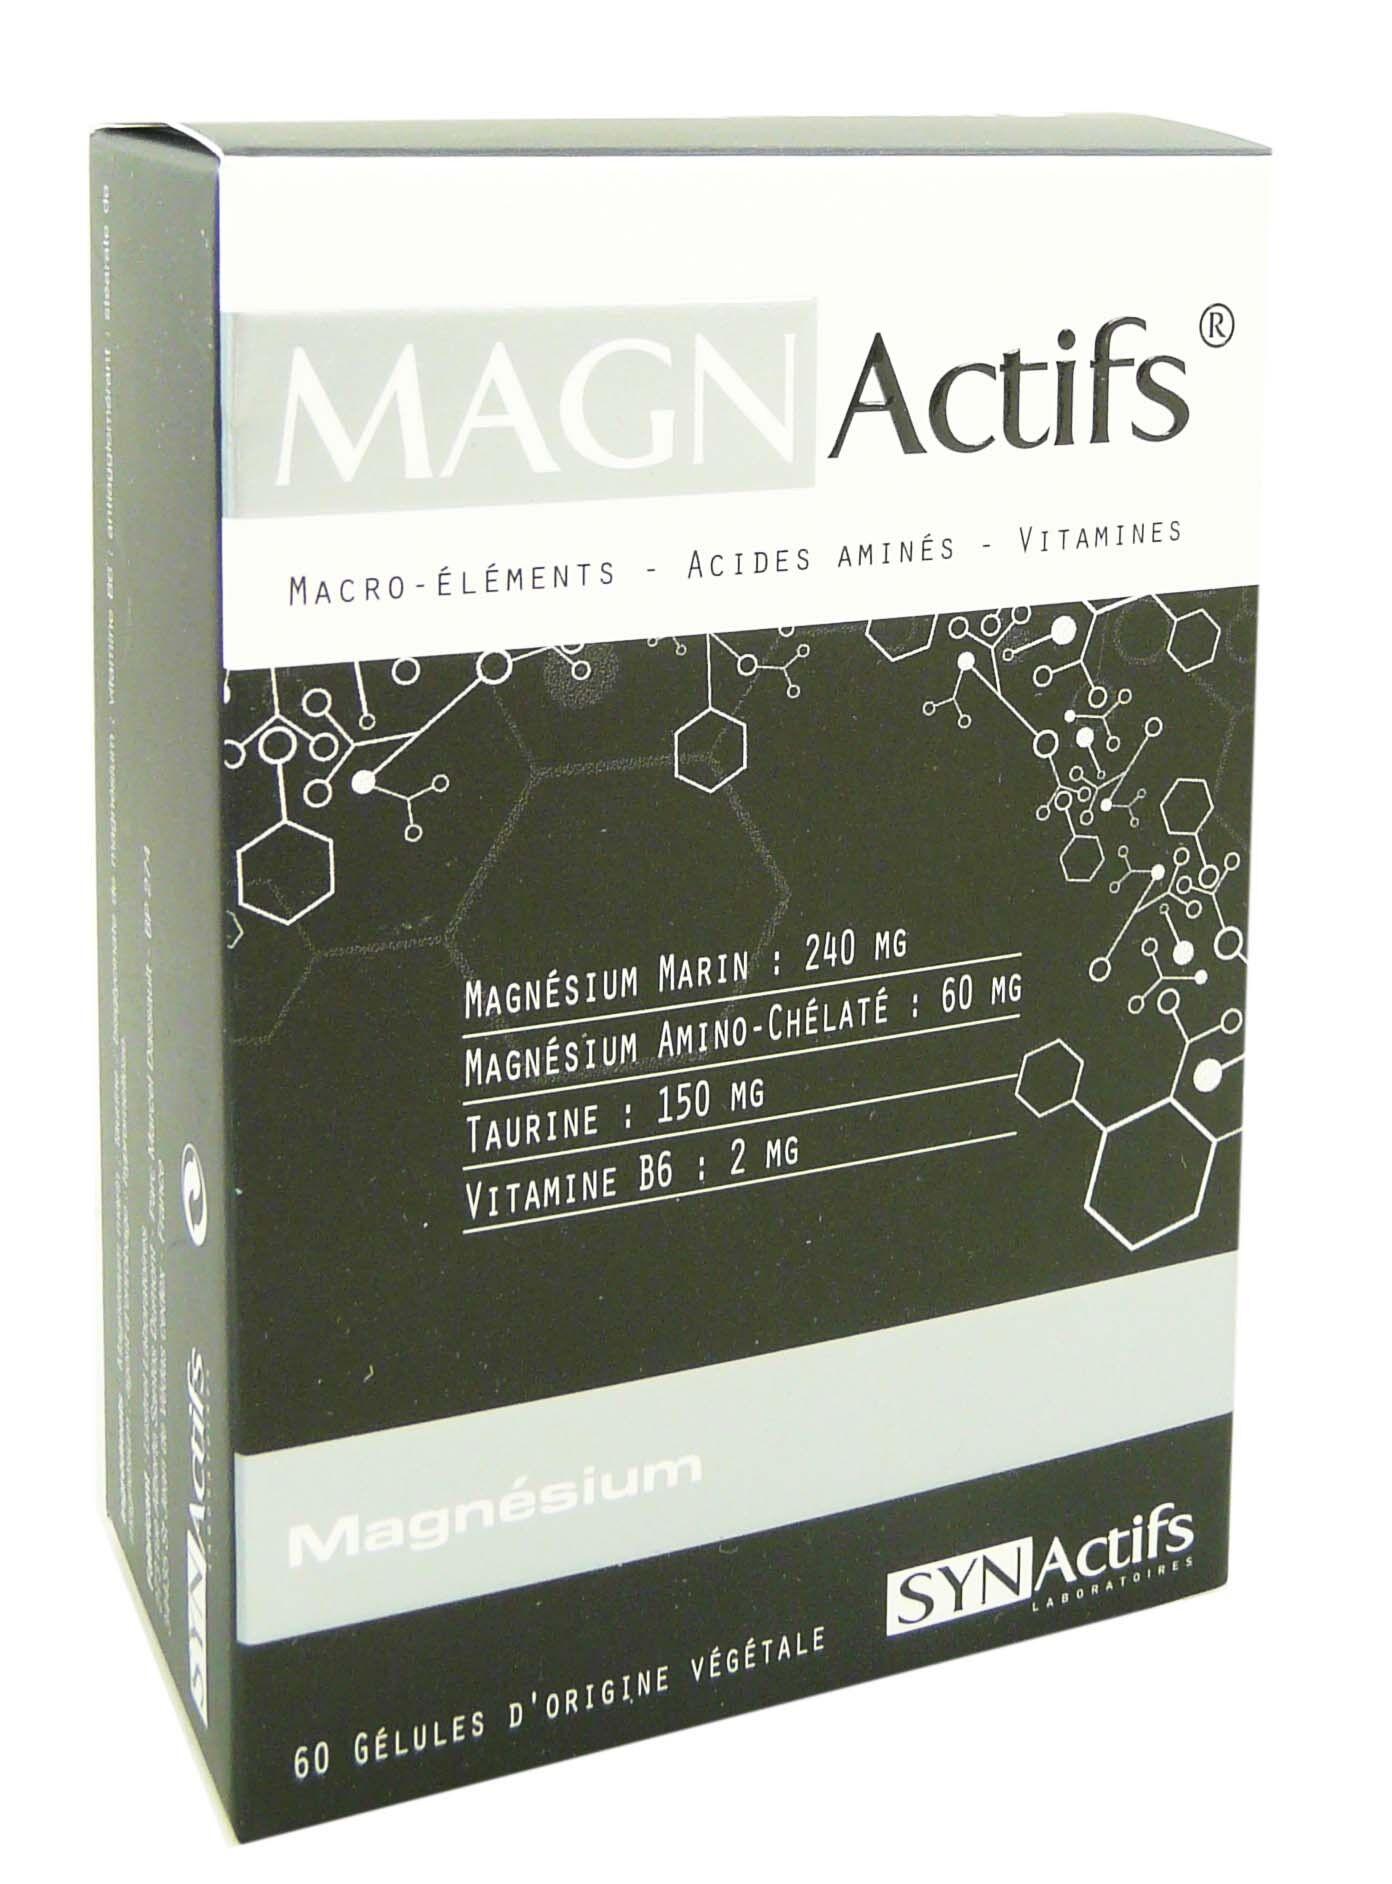 Synactifs magn actifs magnesium 60 gelules